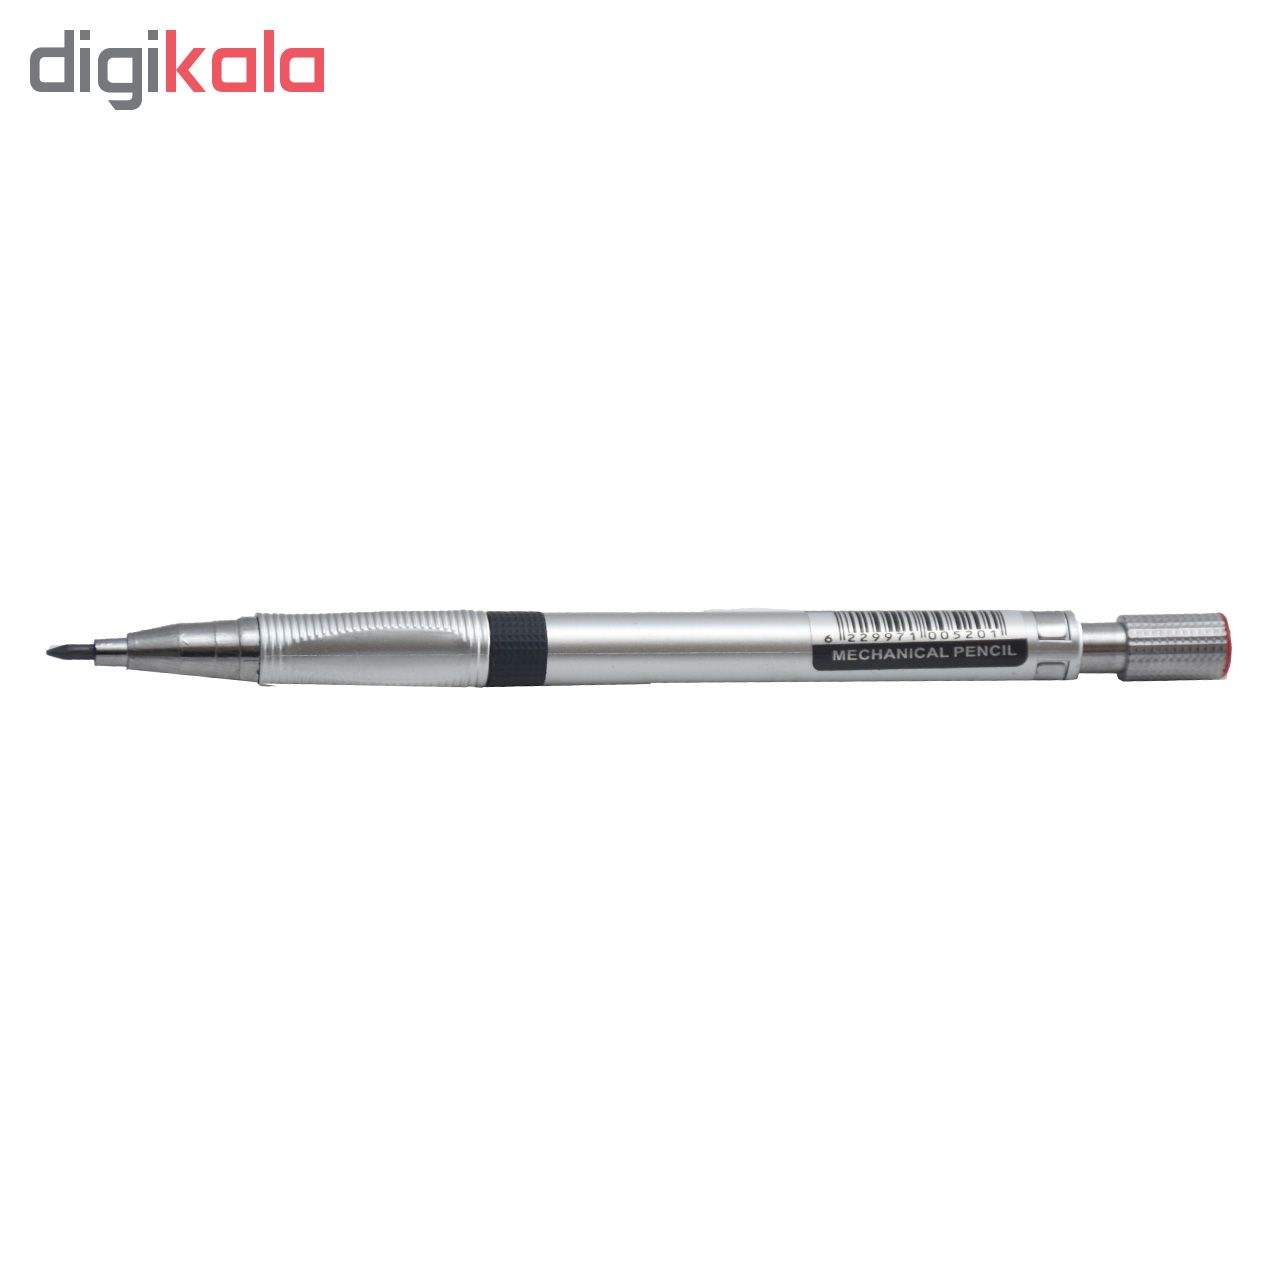 مداد نوکی 2 میلی متری مدل TH-520 main 1 3